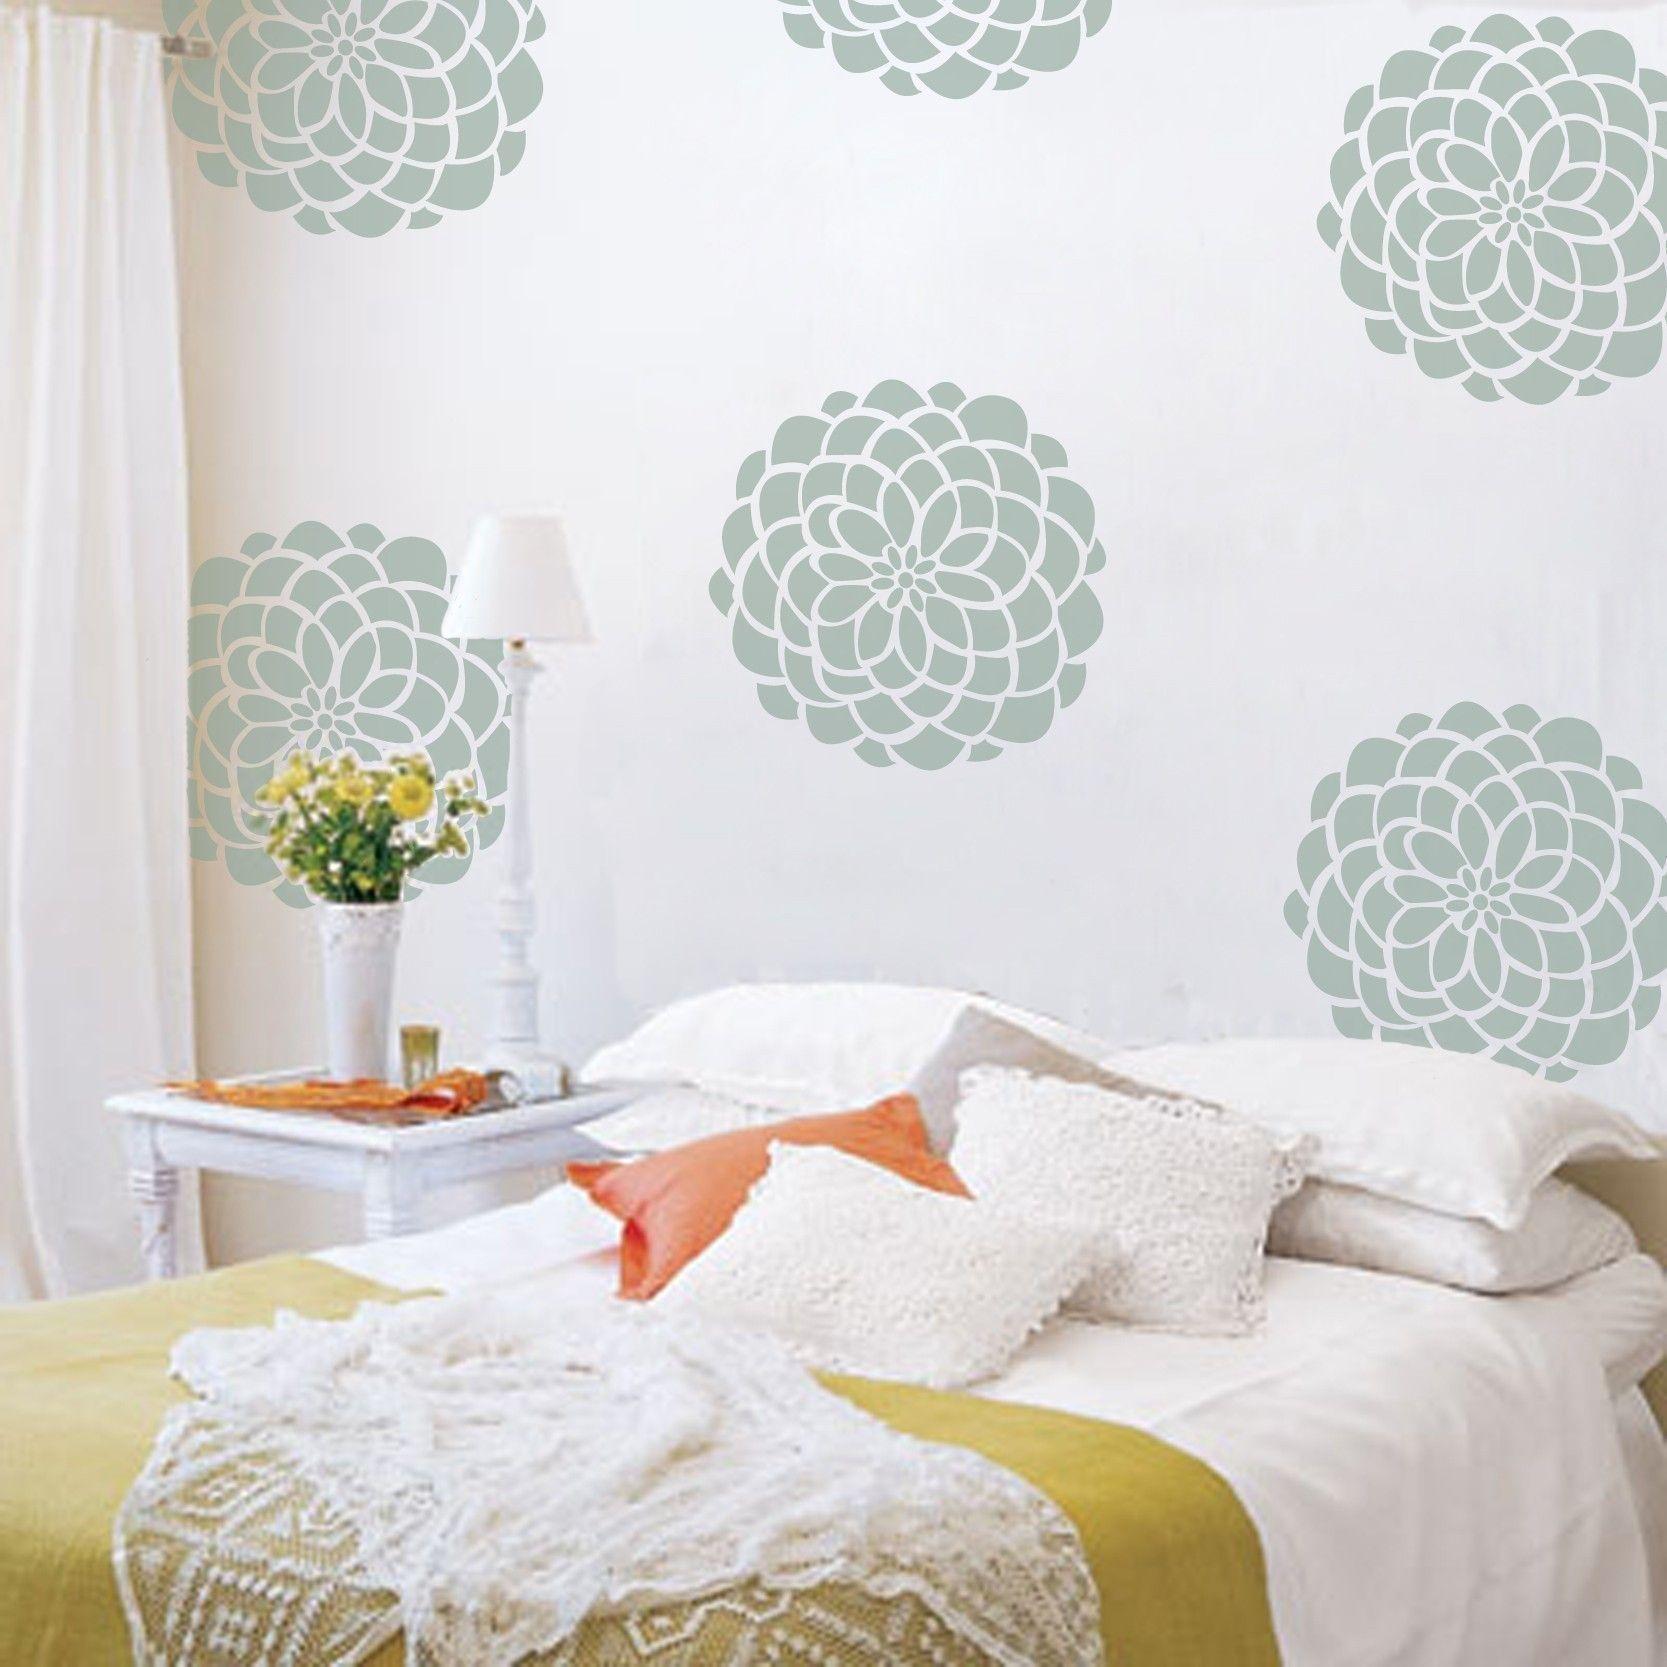 Via decor u byrdie graphics inspiring interiors pinterest